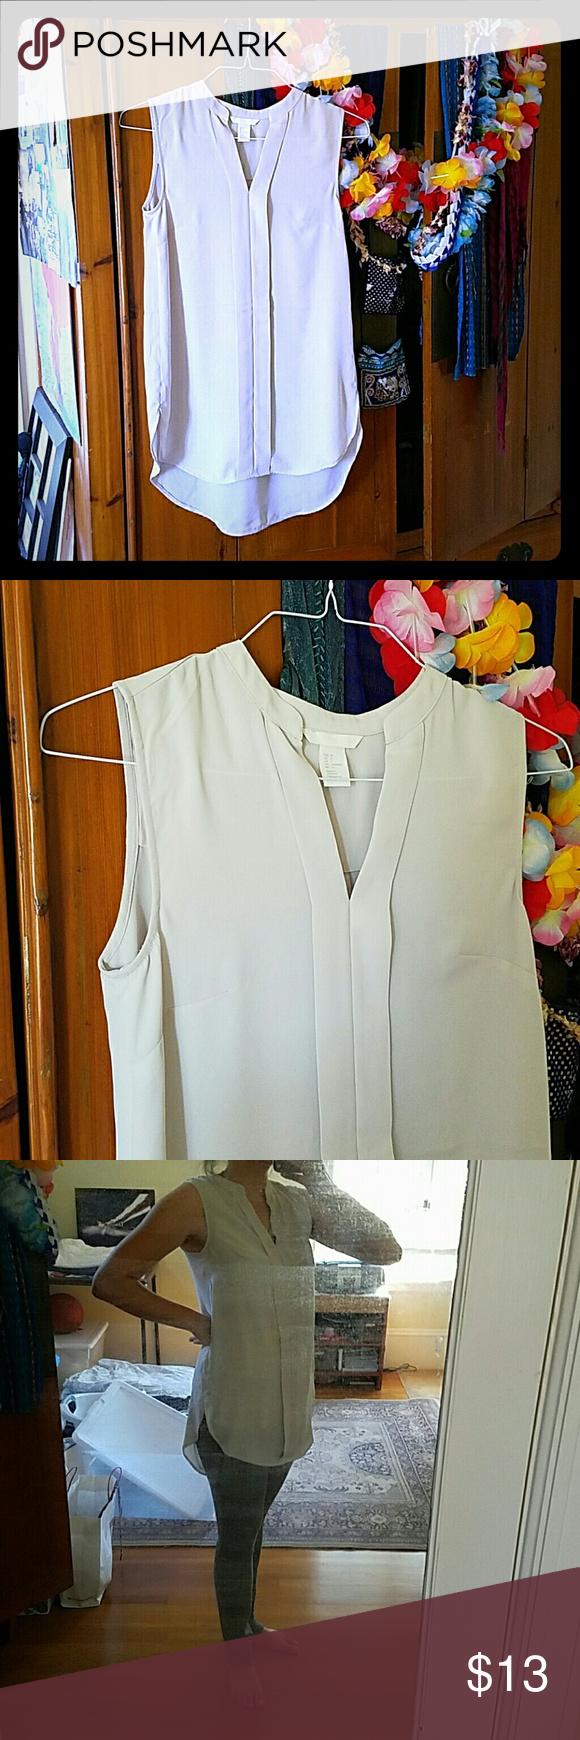 H&M sheer beige office tunic Very light, formal/casual semi-sheer tunic. New, never worn. H&M Tops Tunics